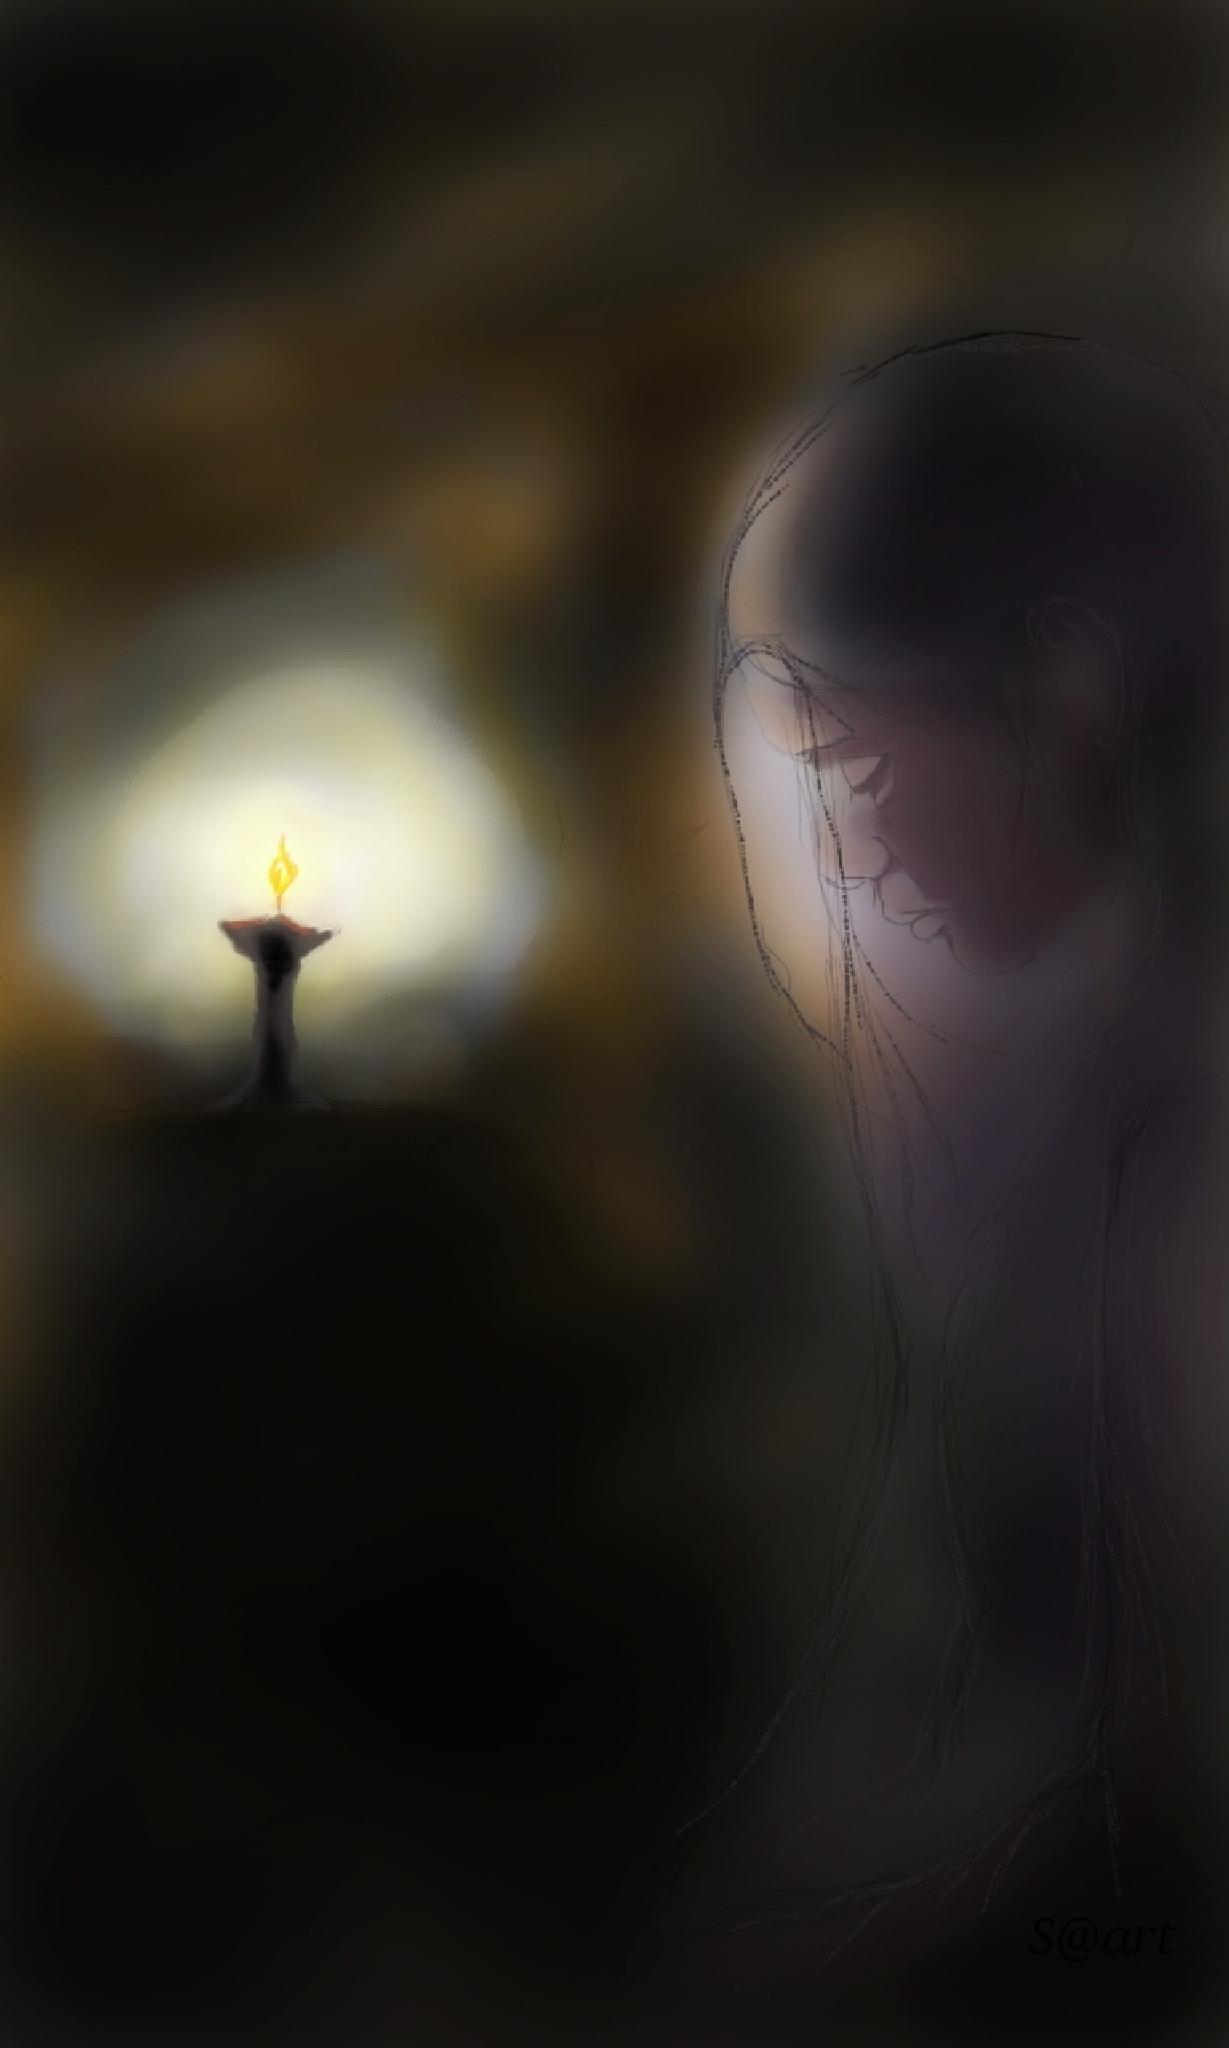 Pray by souralipi